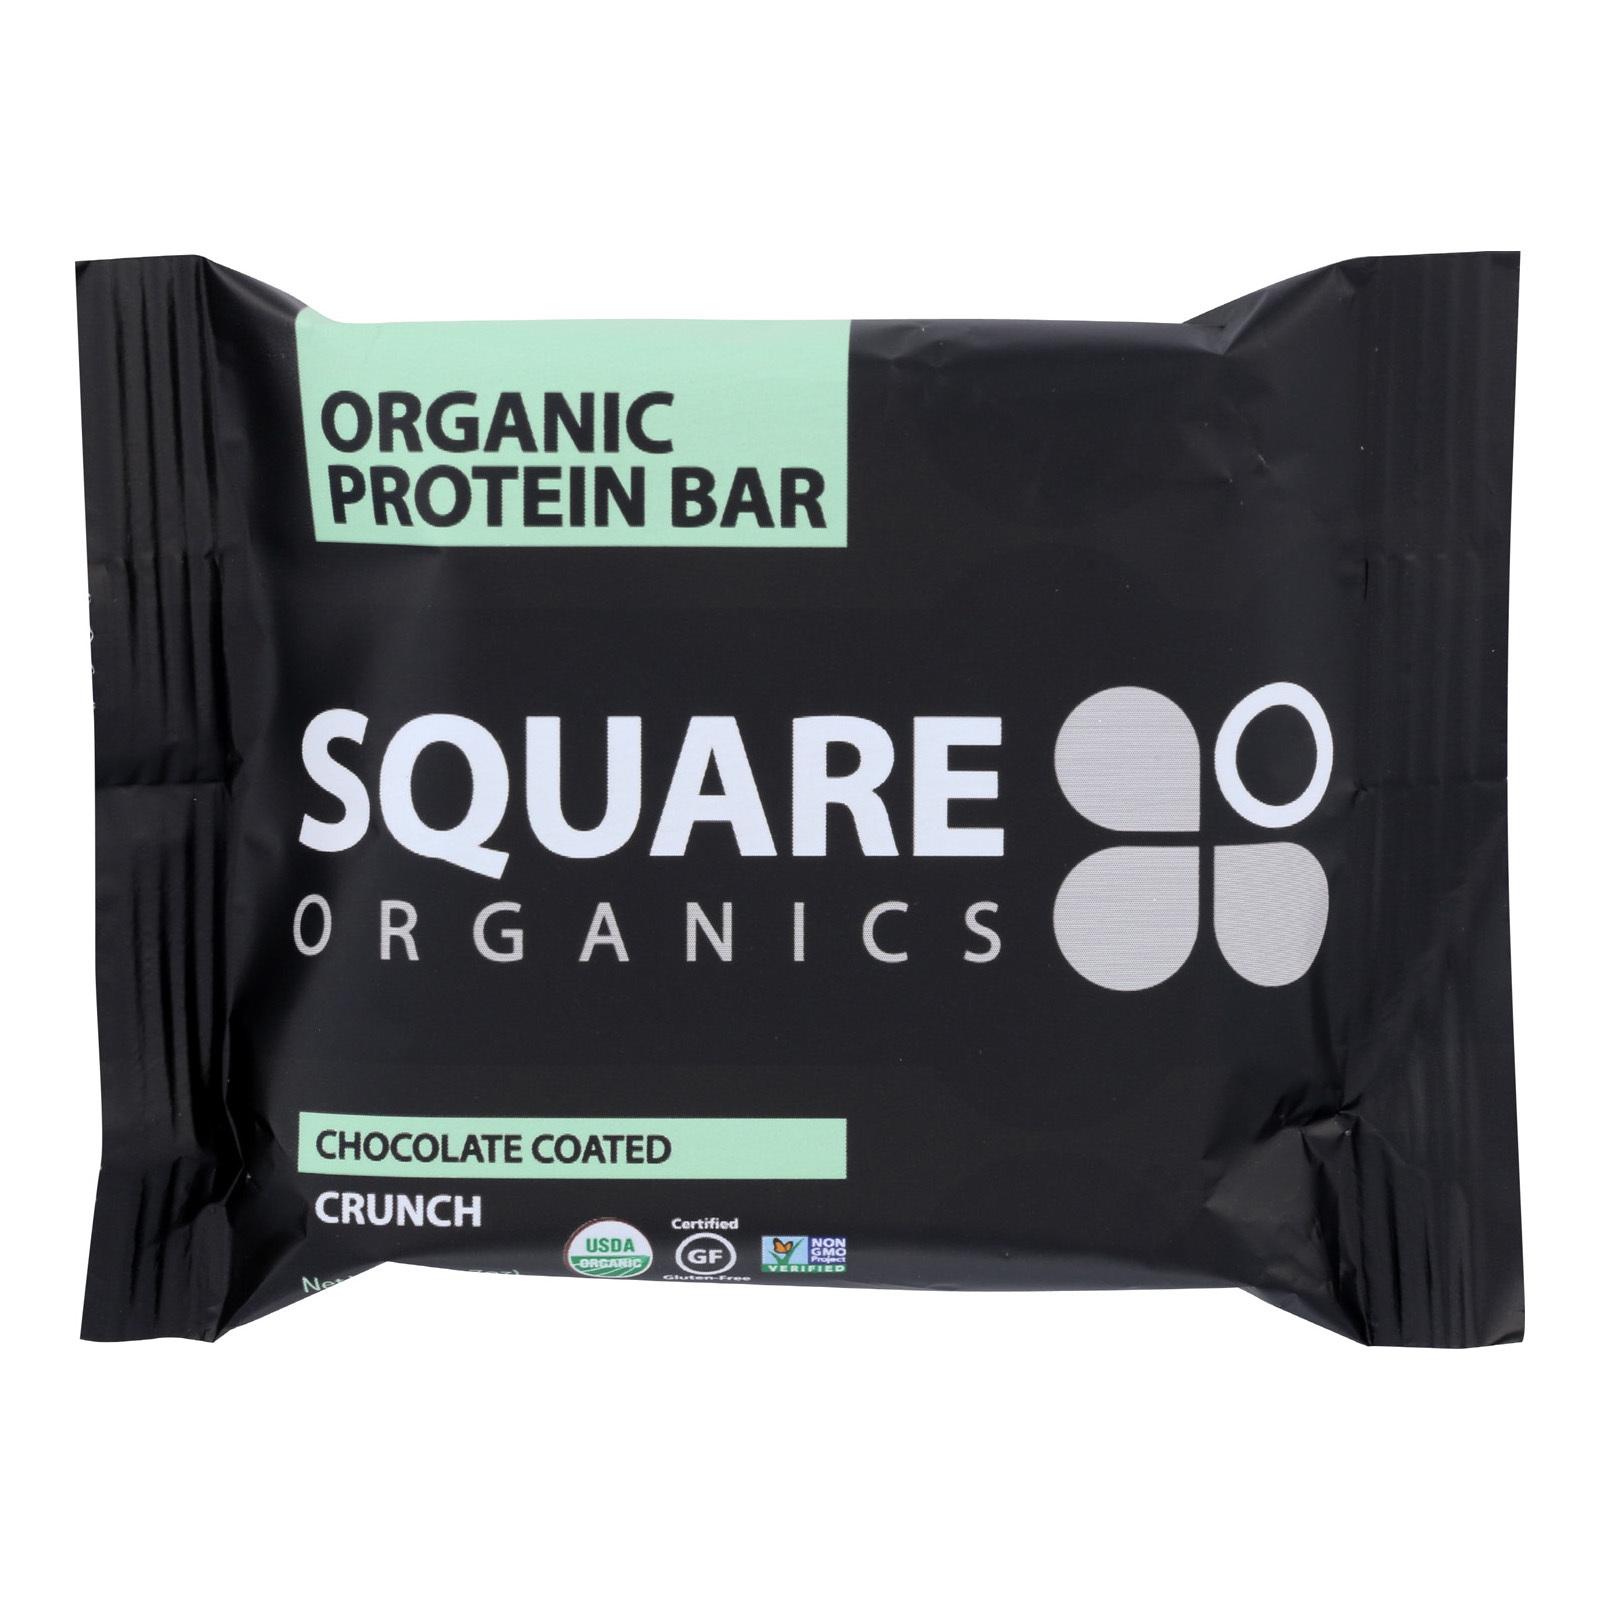 Squarebar Organic Protein Bar - Cocoa Crunch - 1.7 oz - Case of 12